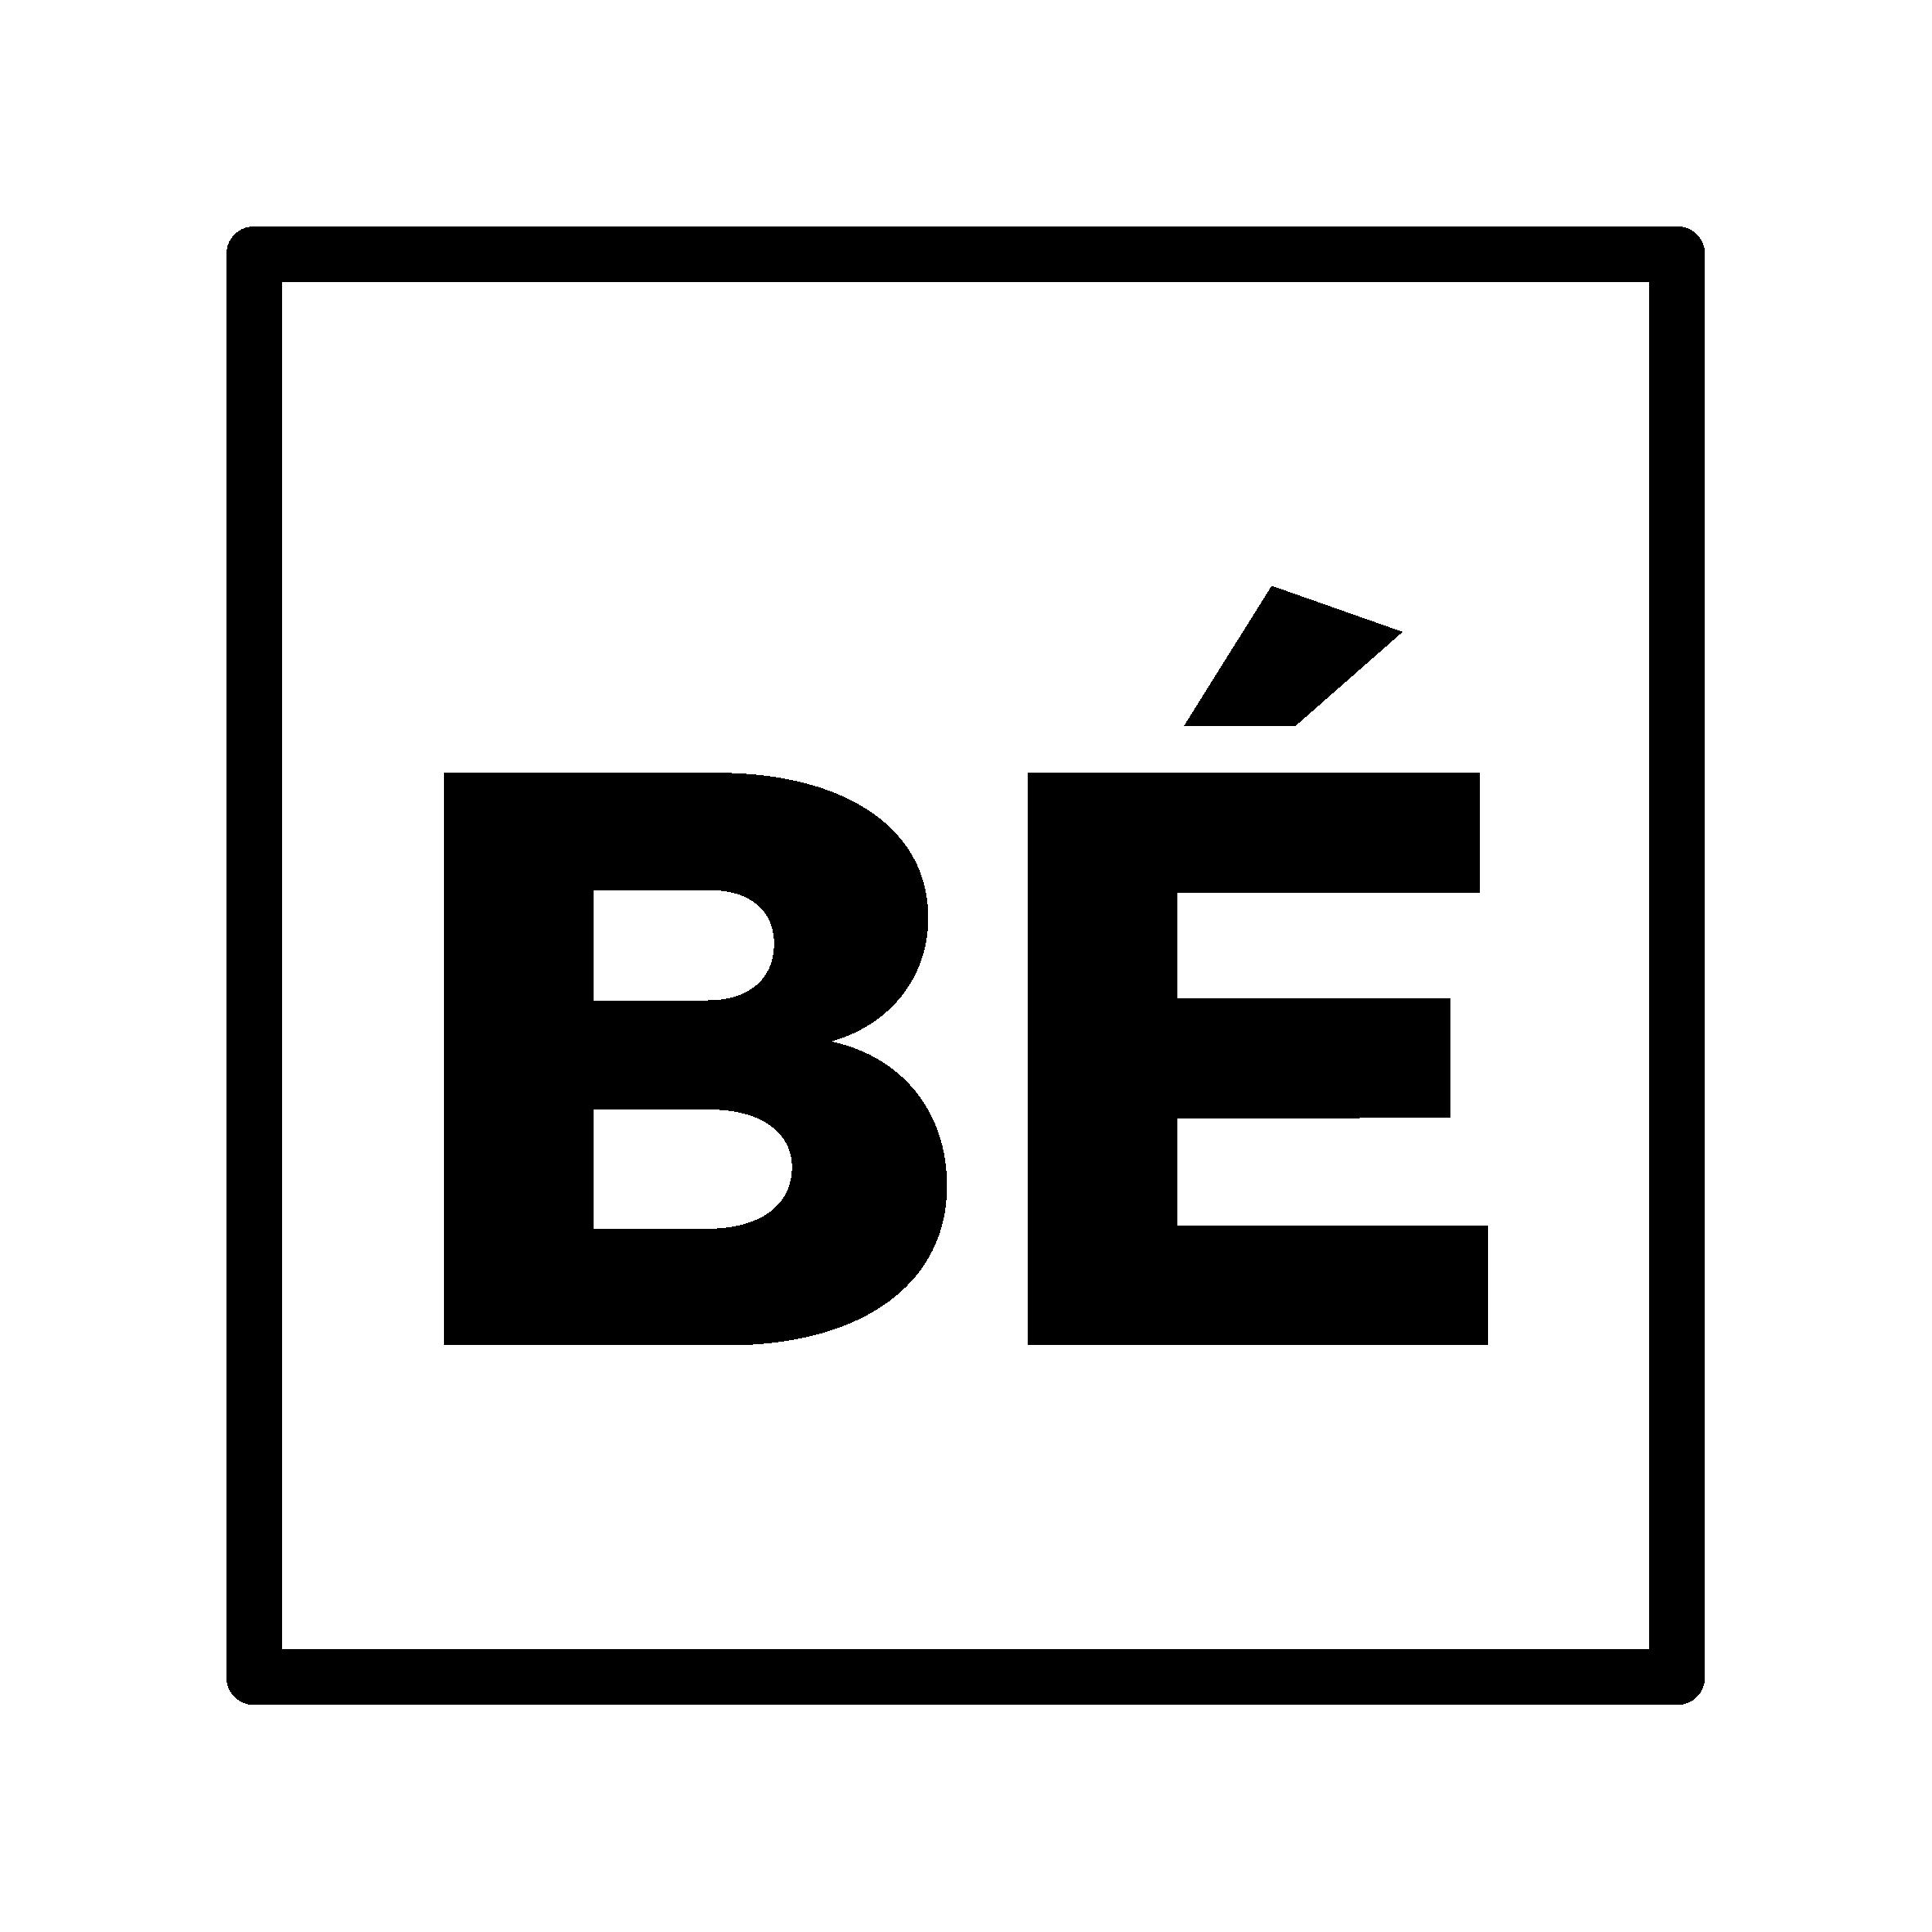 Éva Bénès